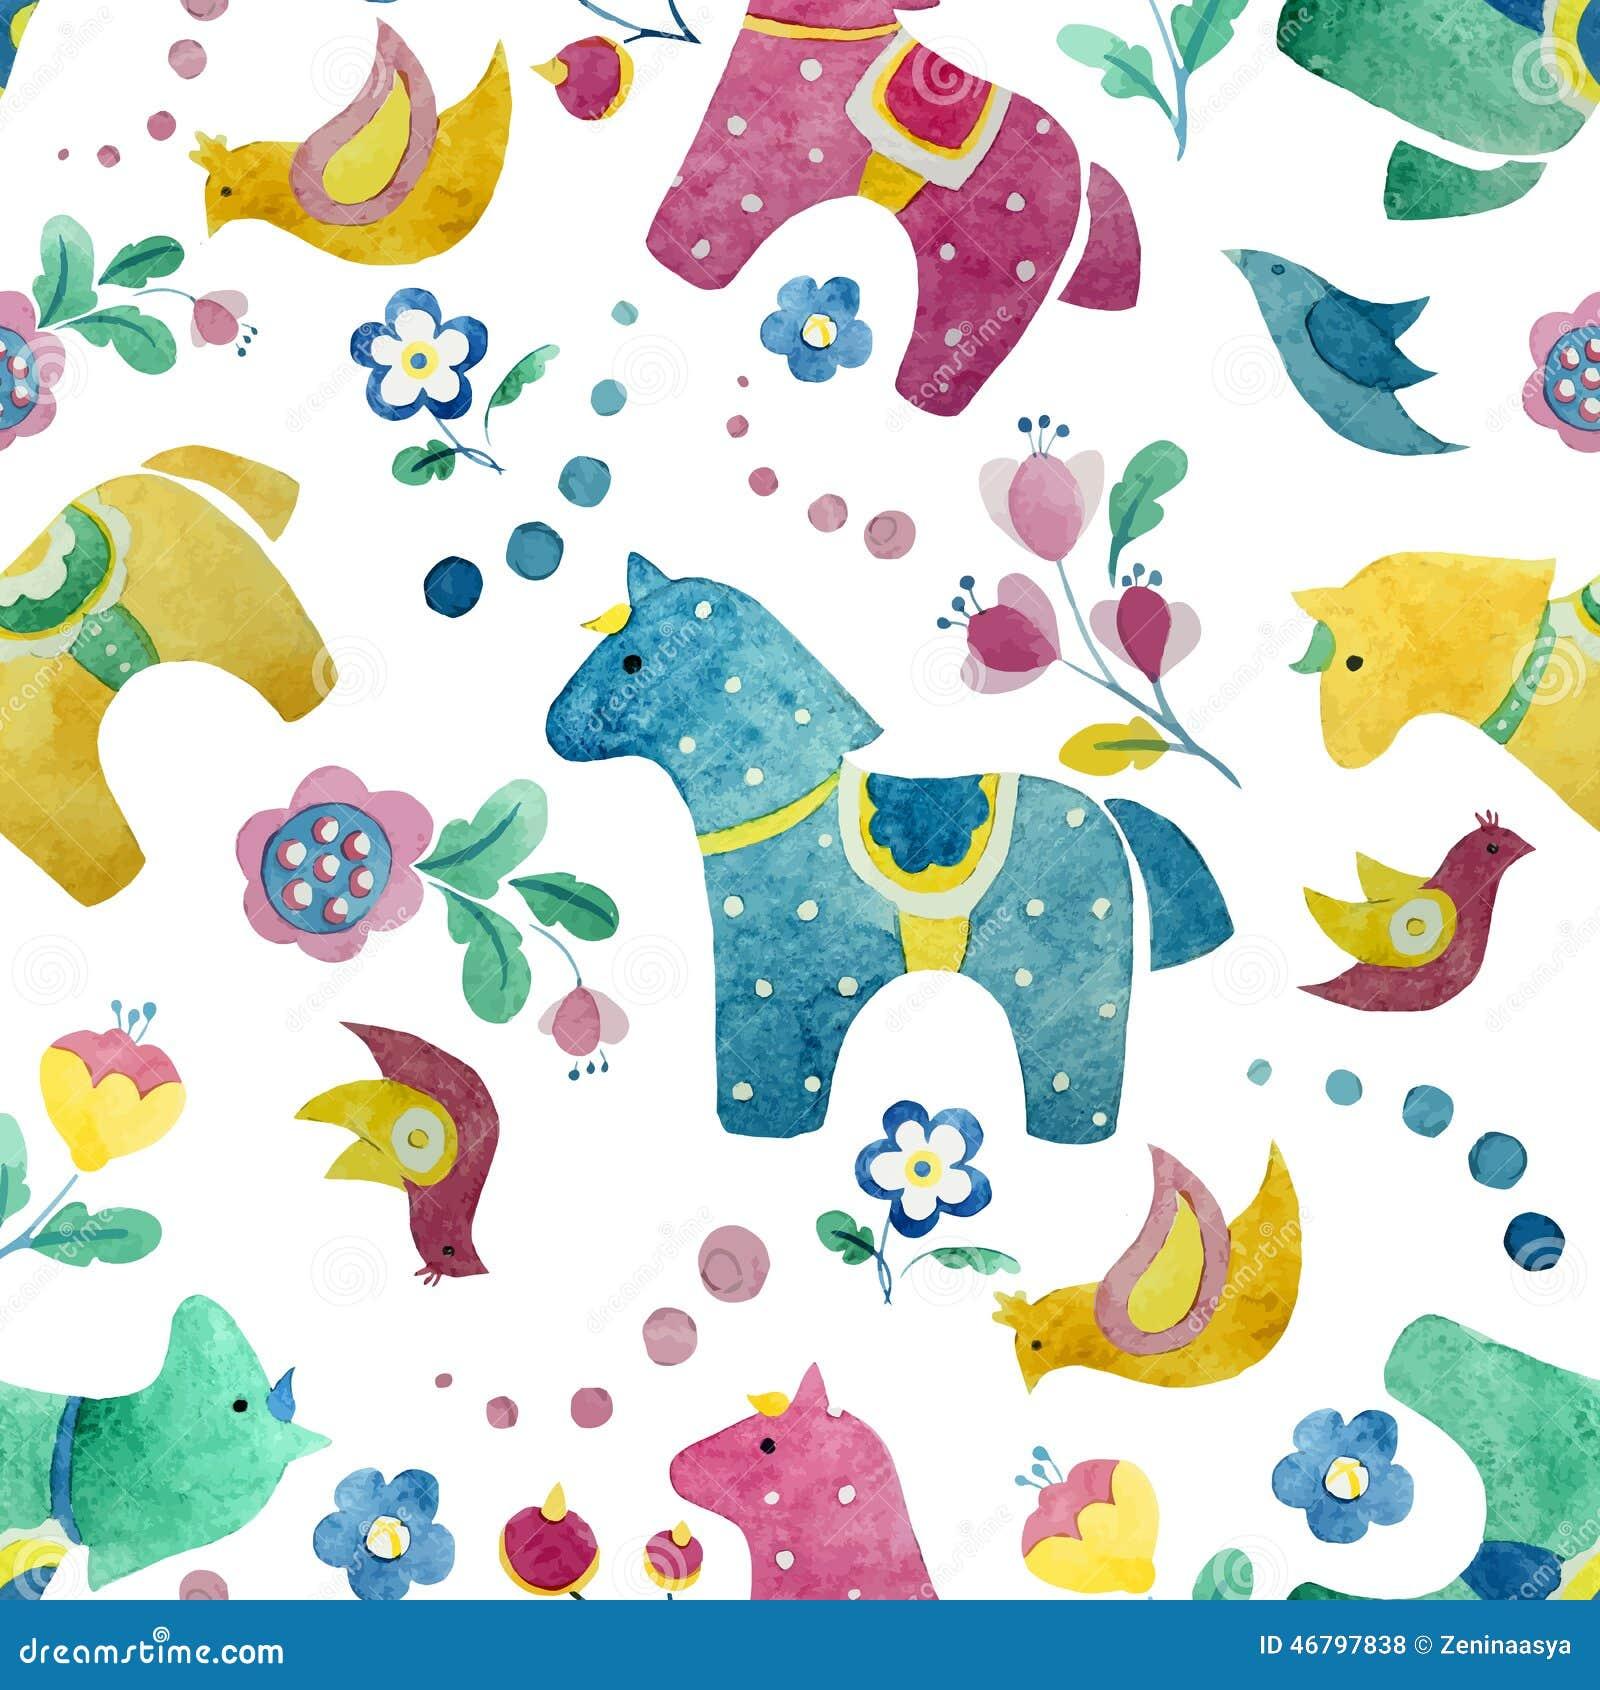 Funny Horse Wallpaper Pattern Flower Bird Stock Vector Illustration Of Abstract Horse 46797838